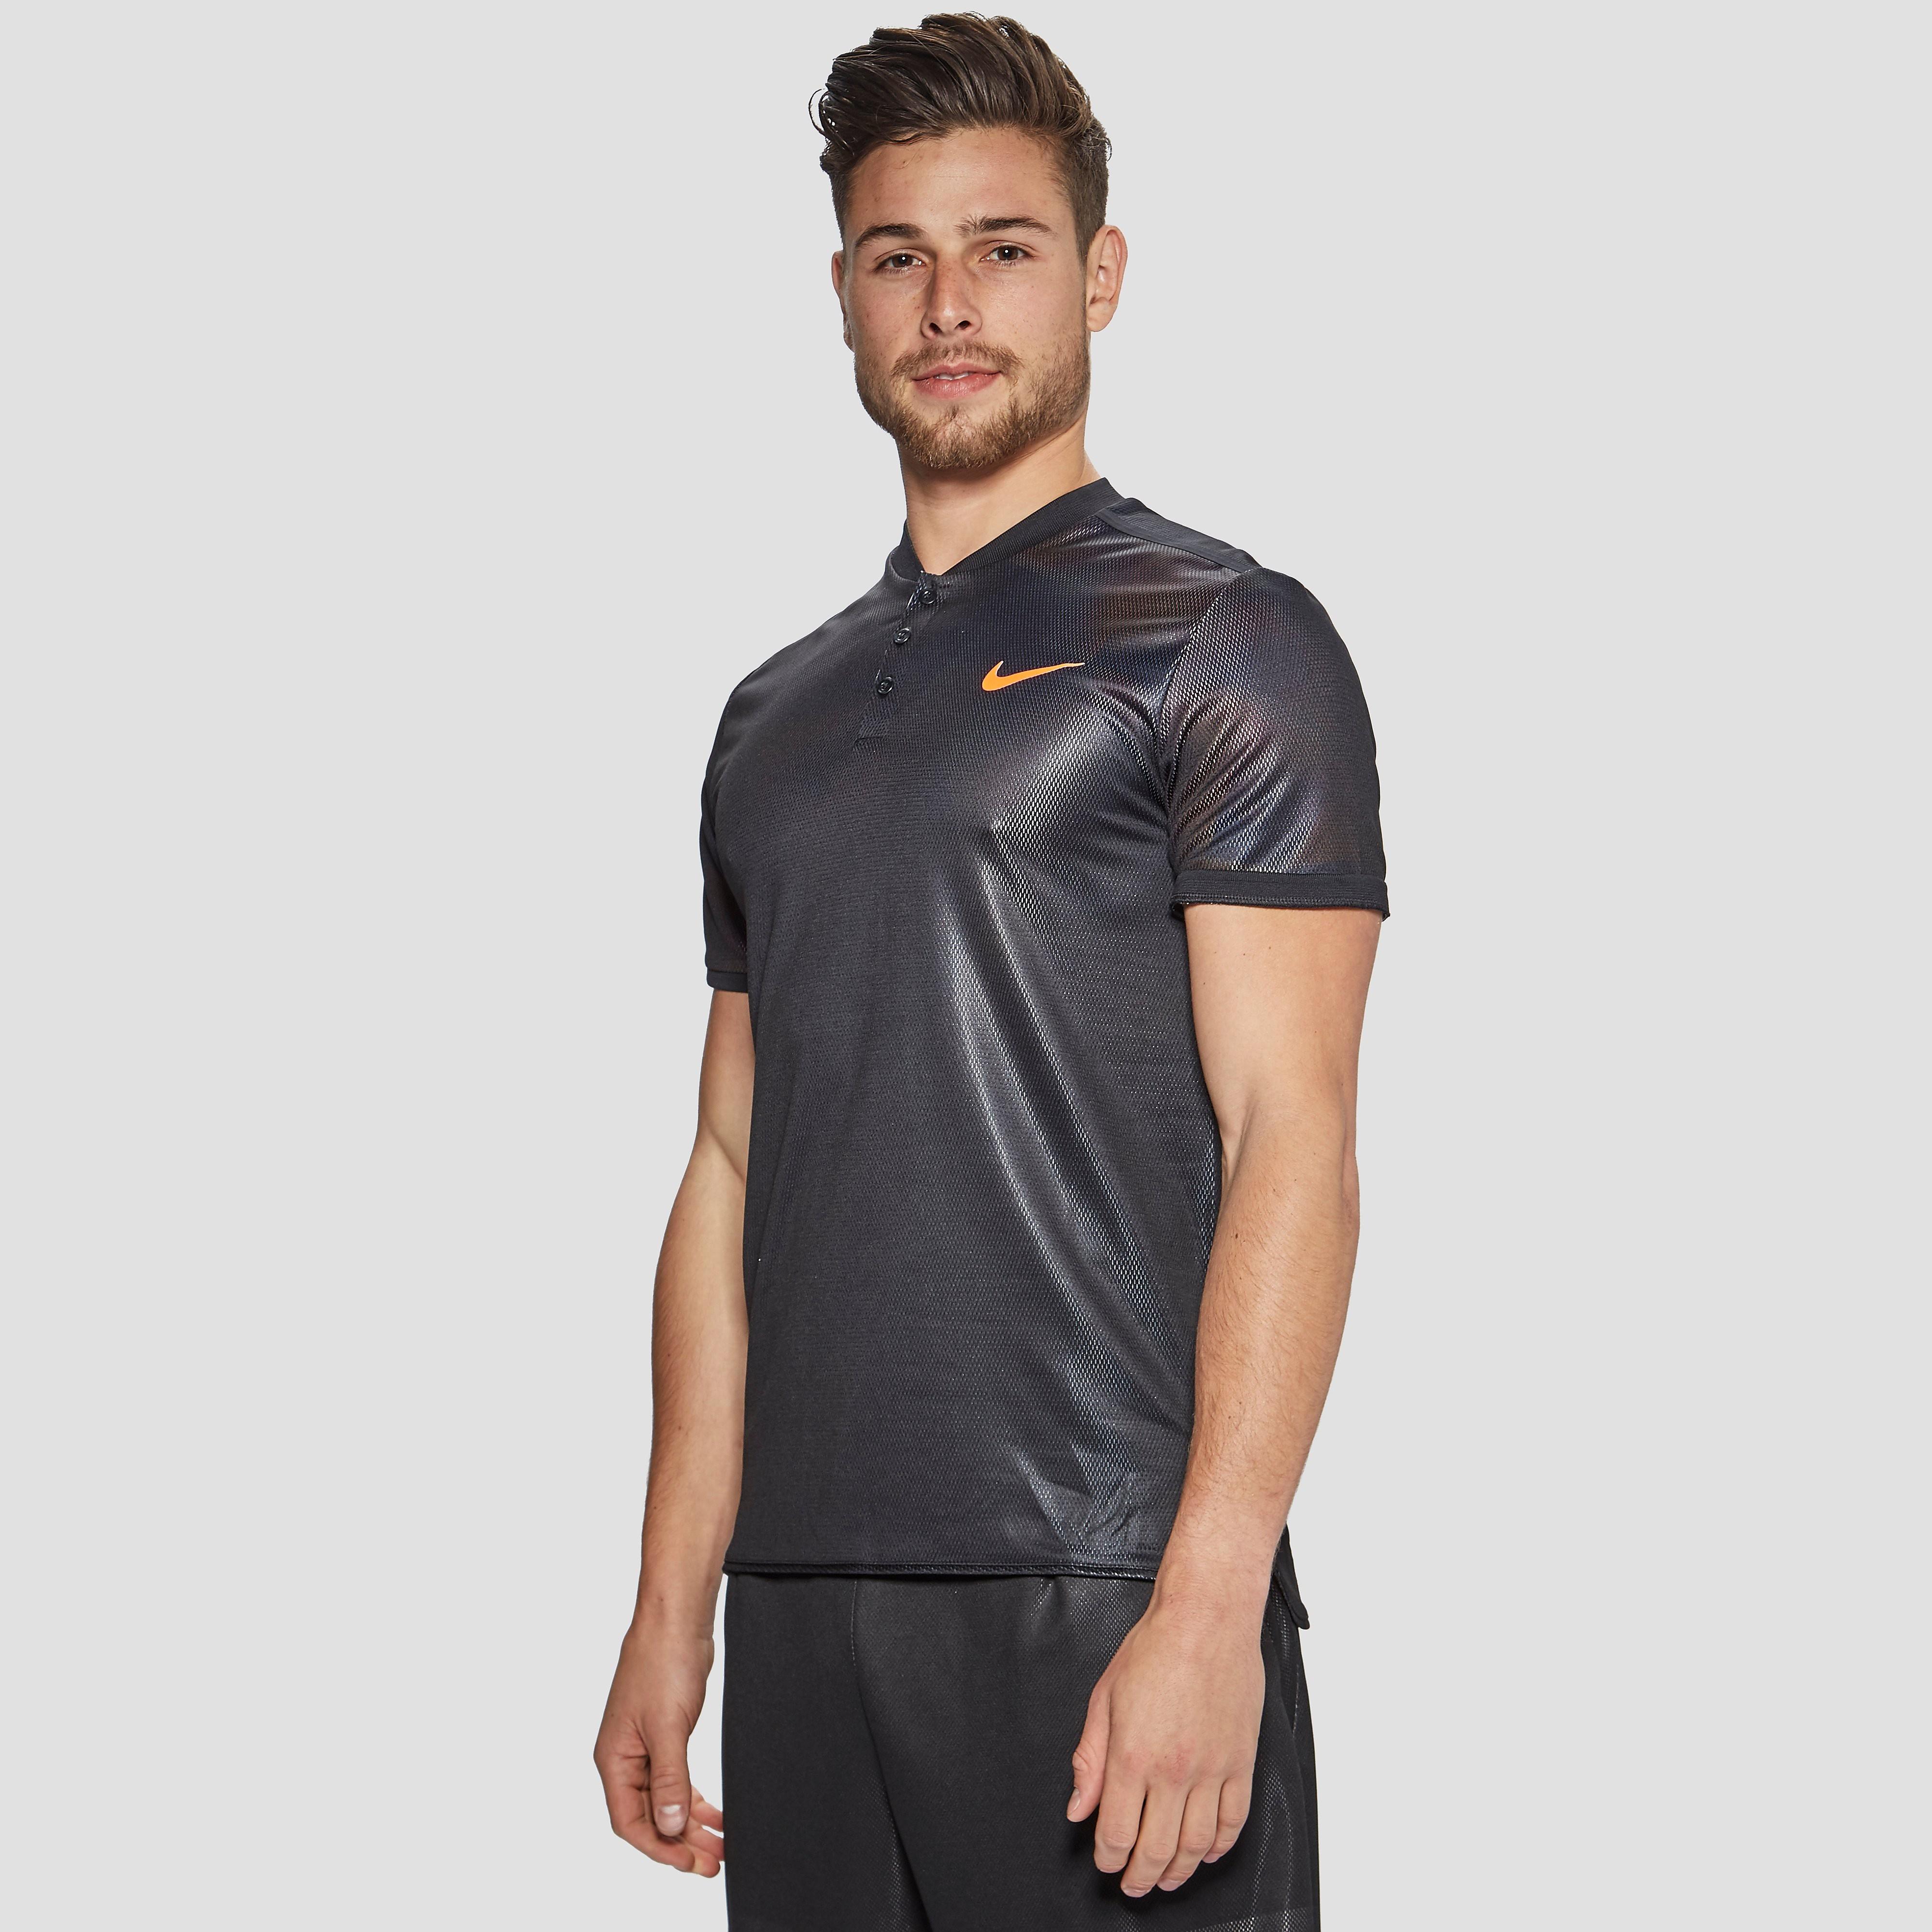 Nike Court Dry Advantage Men's Tennis Polo